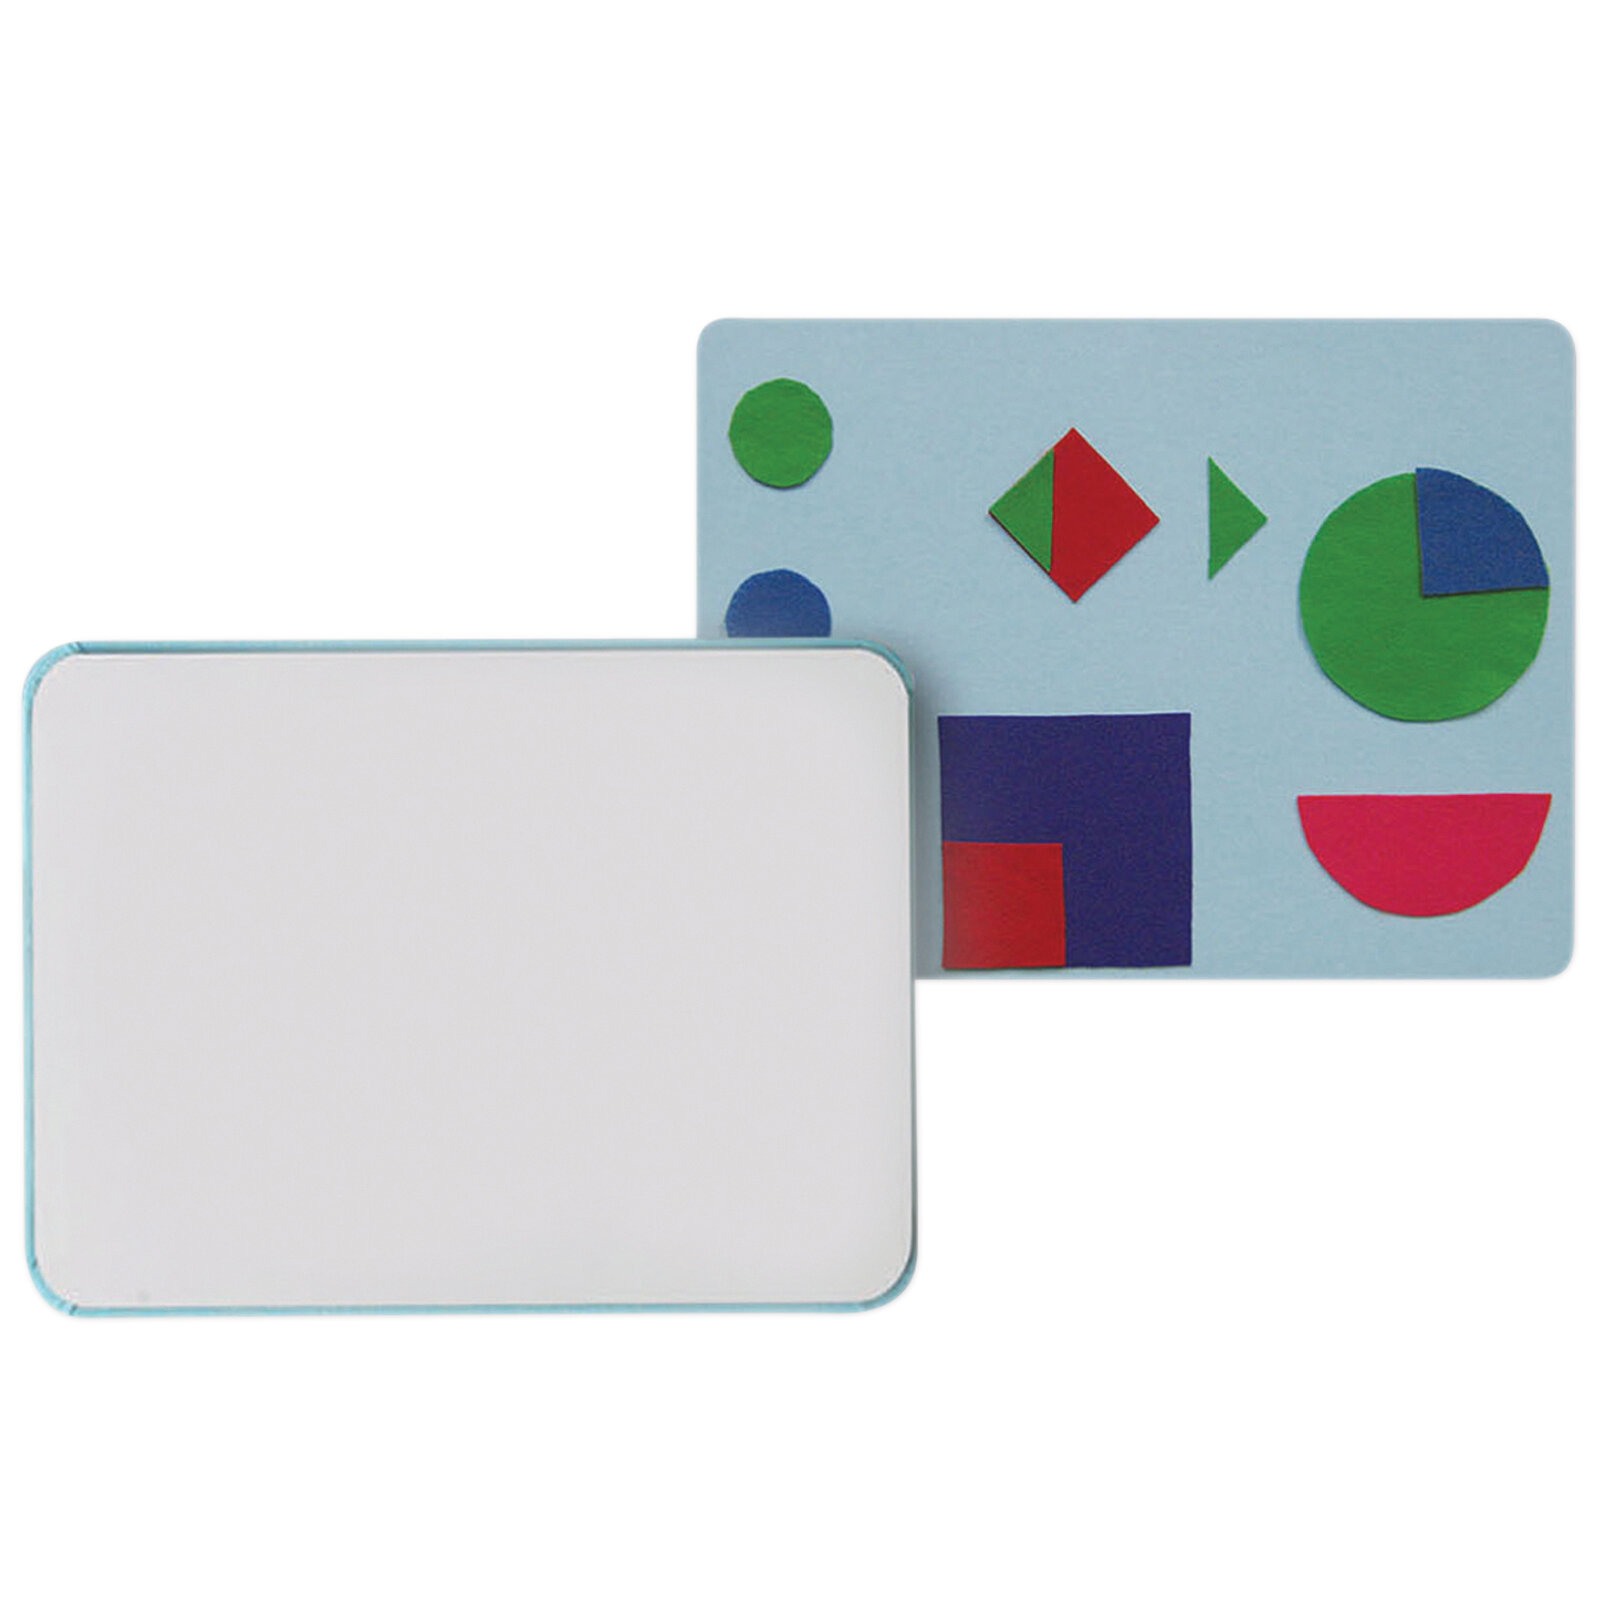 Flipside Flannel Dry Erase Board Notepad Wayfair